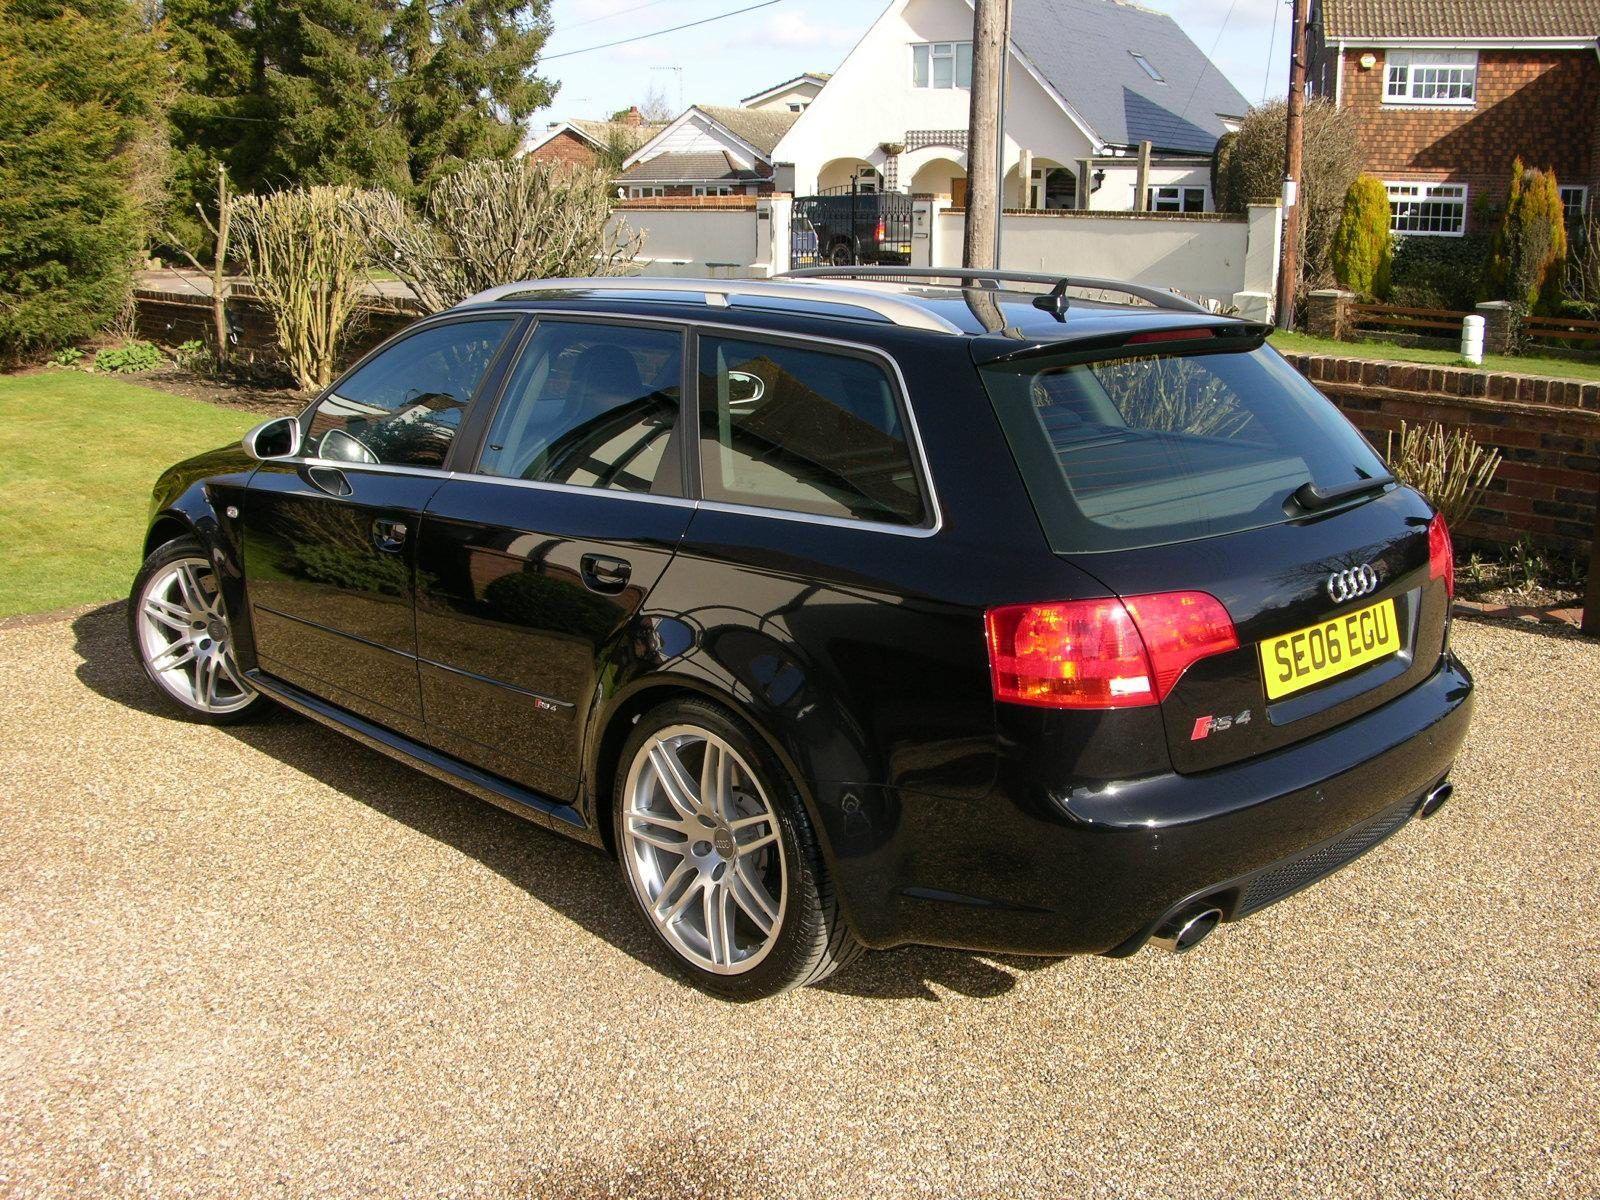 Black Audi RS3 Avant on driveway